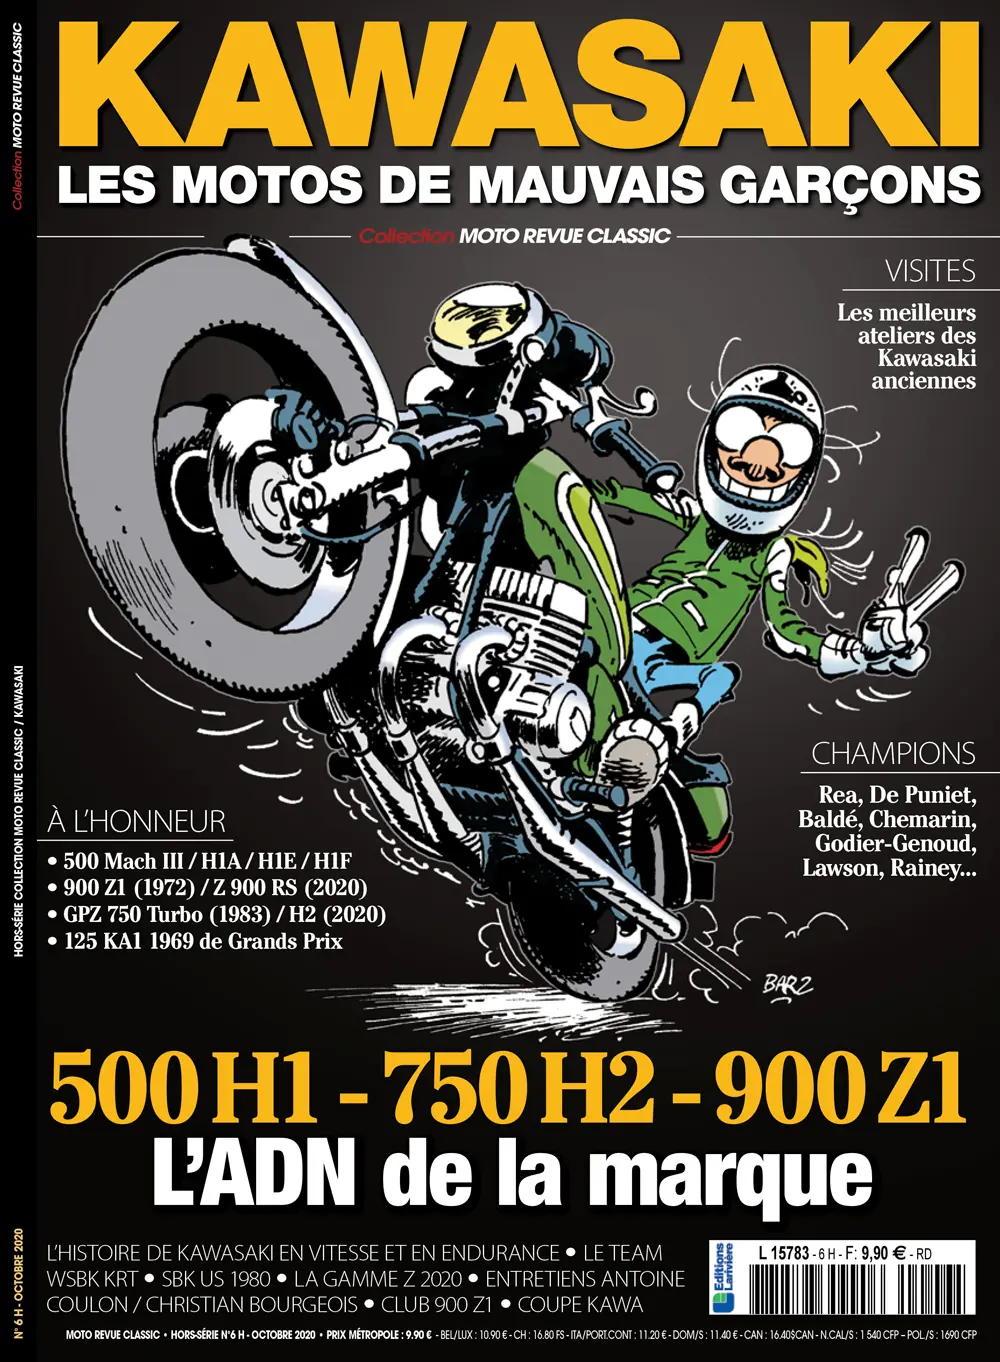 Coupes Kawasaki - l'Histoire Moto-r10